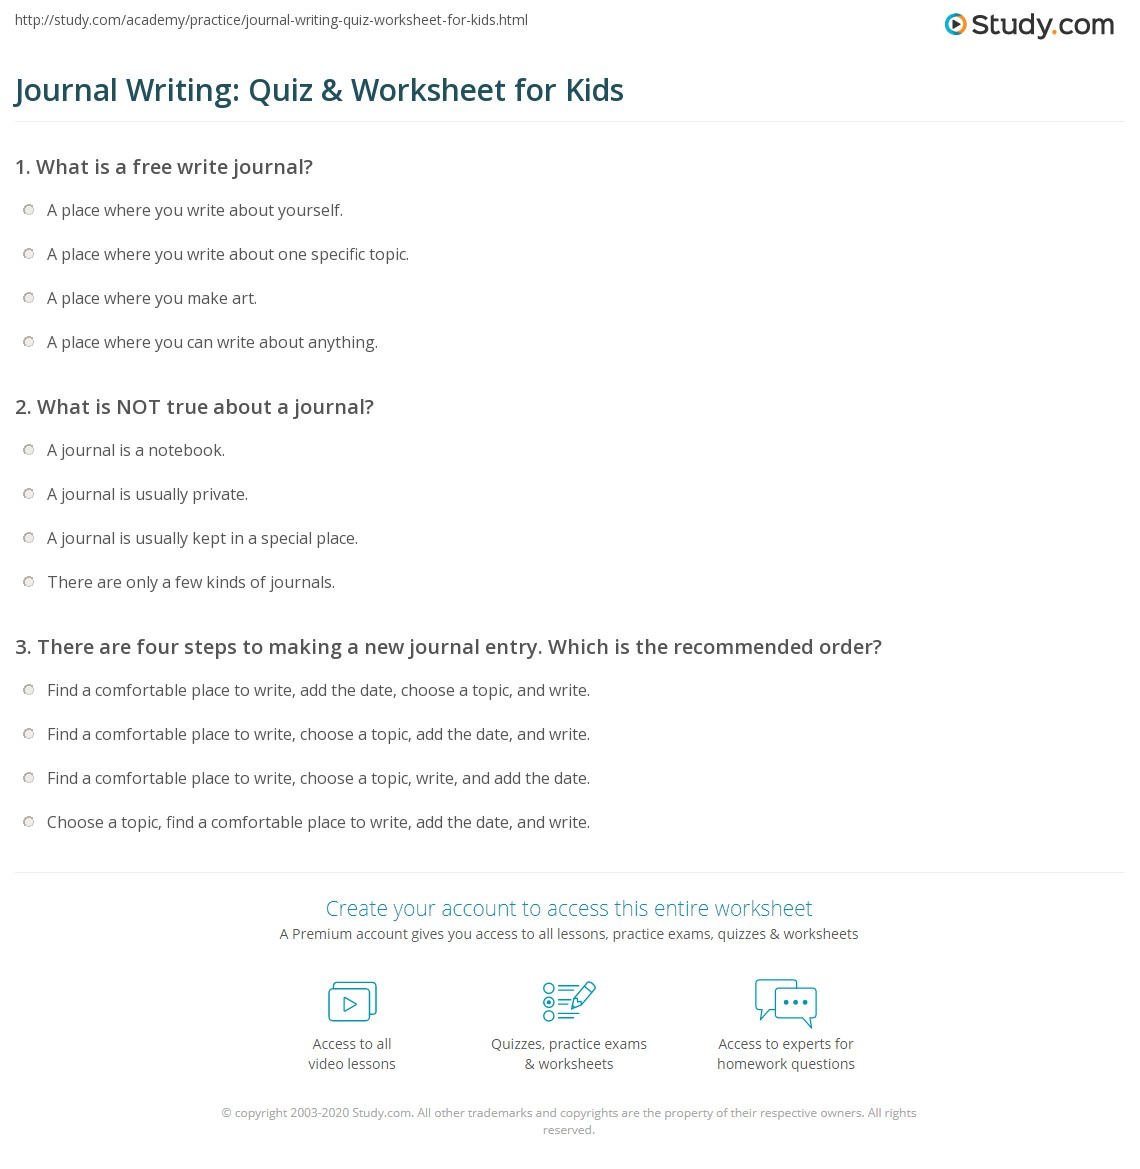 journal writing quiz worksheet for kids study com